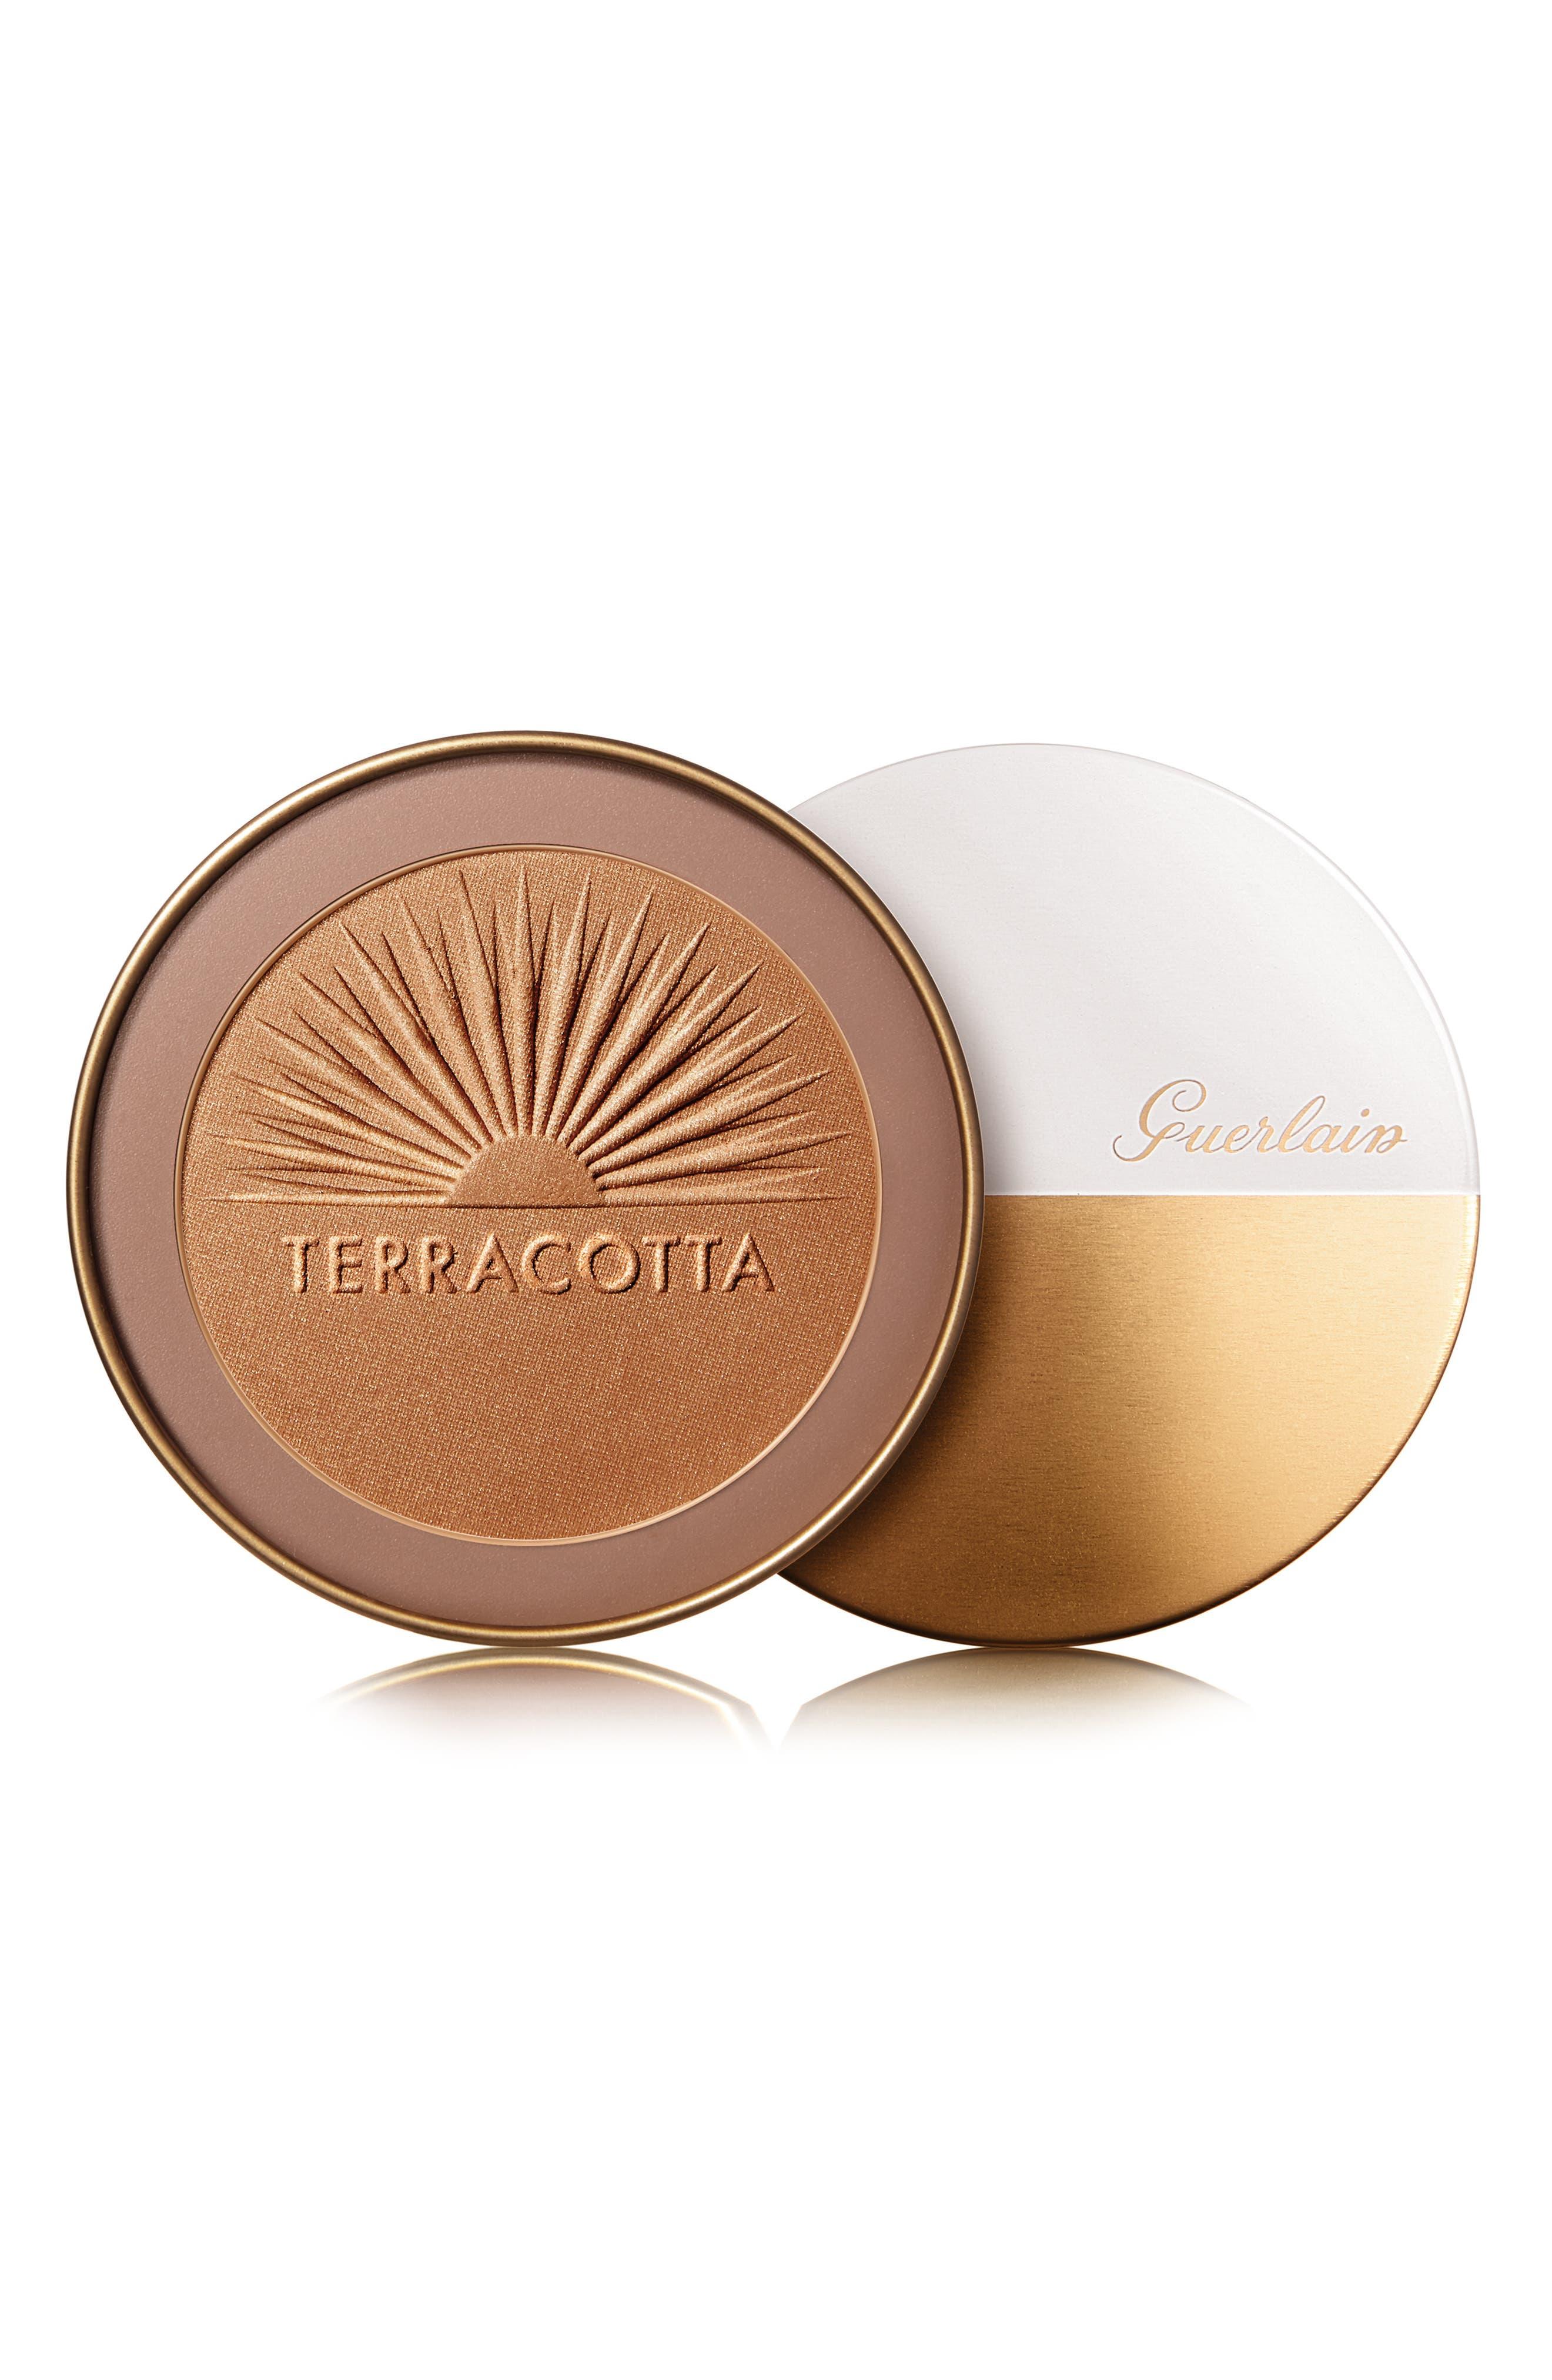 Guerlain Terracotta Ultra Shine (Limited Edition)